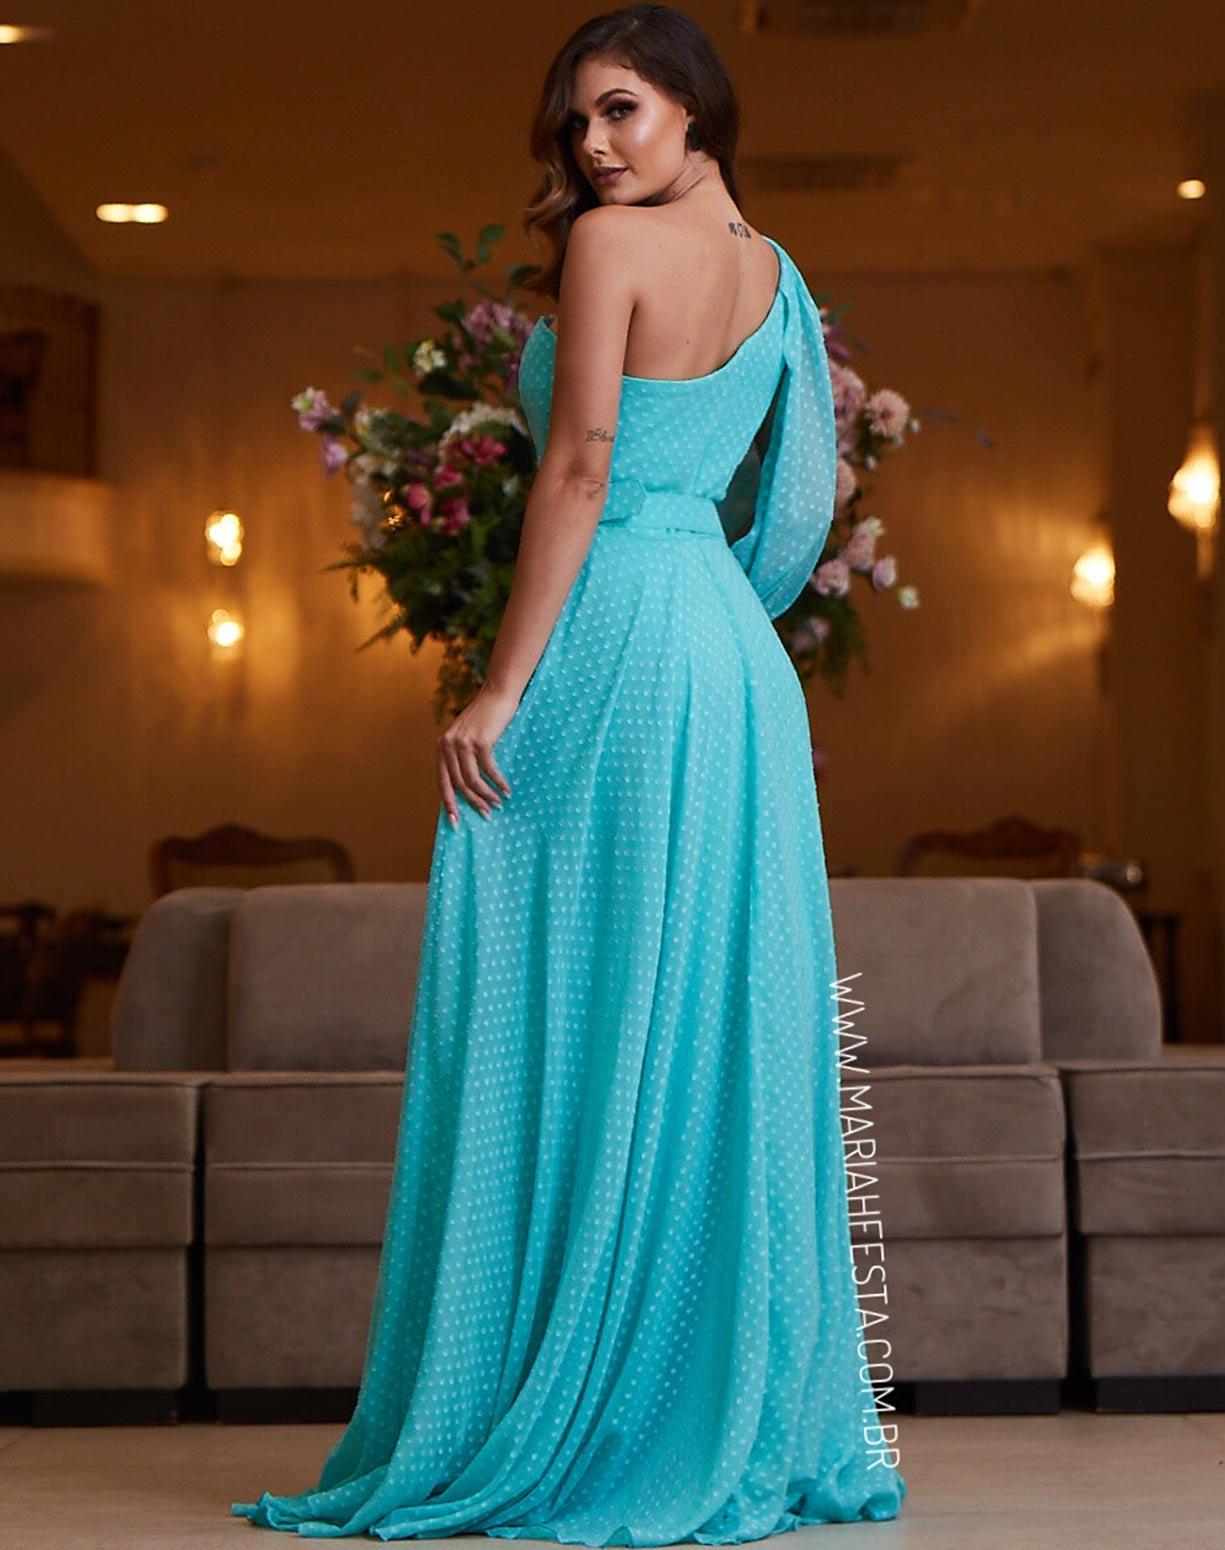 Vestido Tiffany de um Ombro Só Texturizado